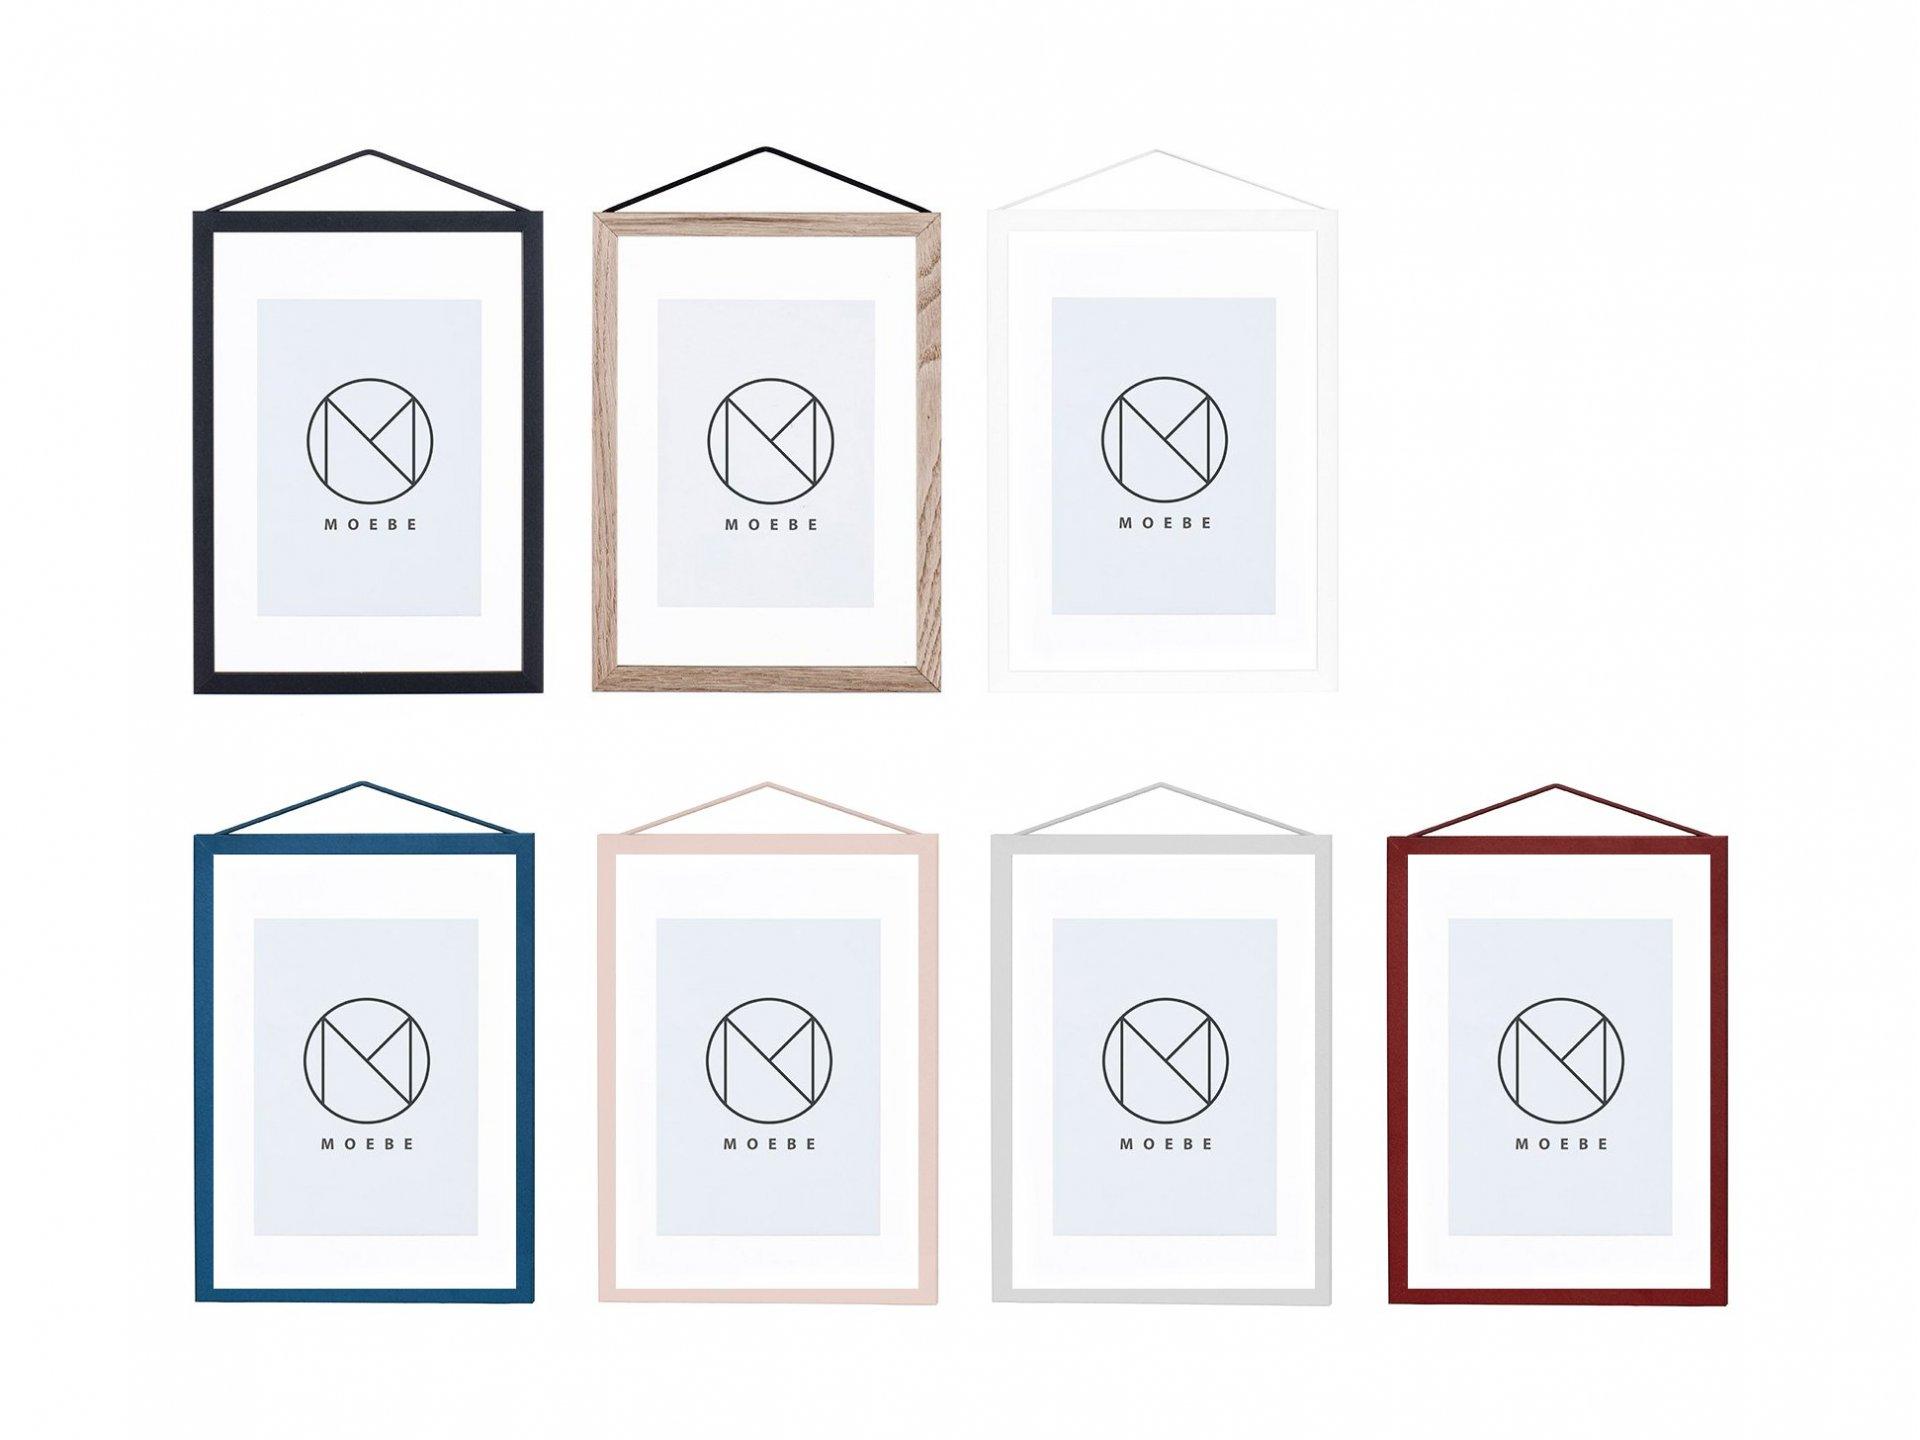 Moebe Rahmen Frame online kaufen   Modulor Online Shop